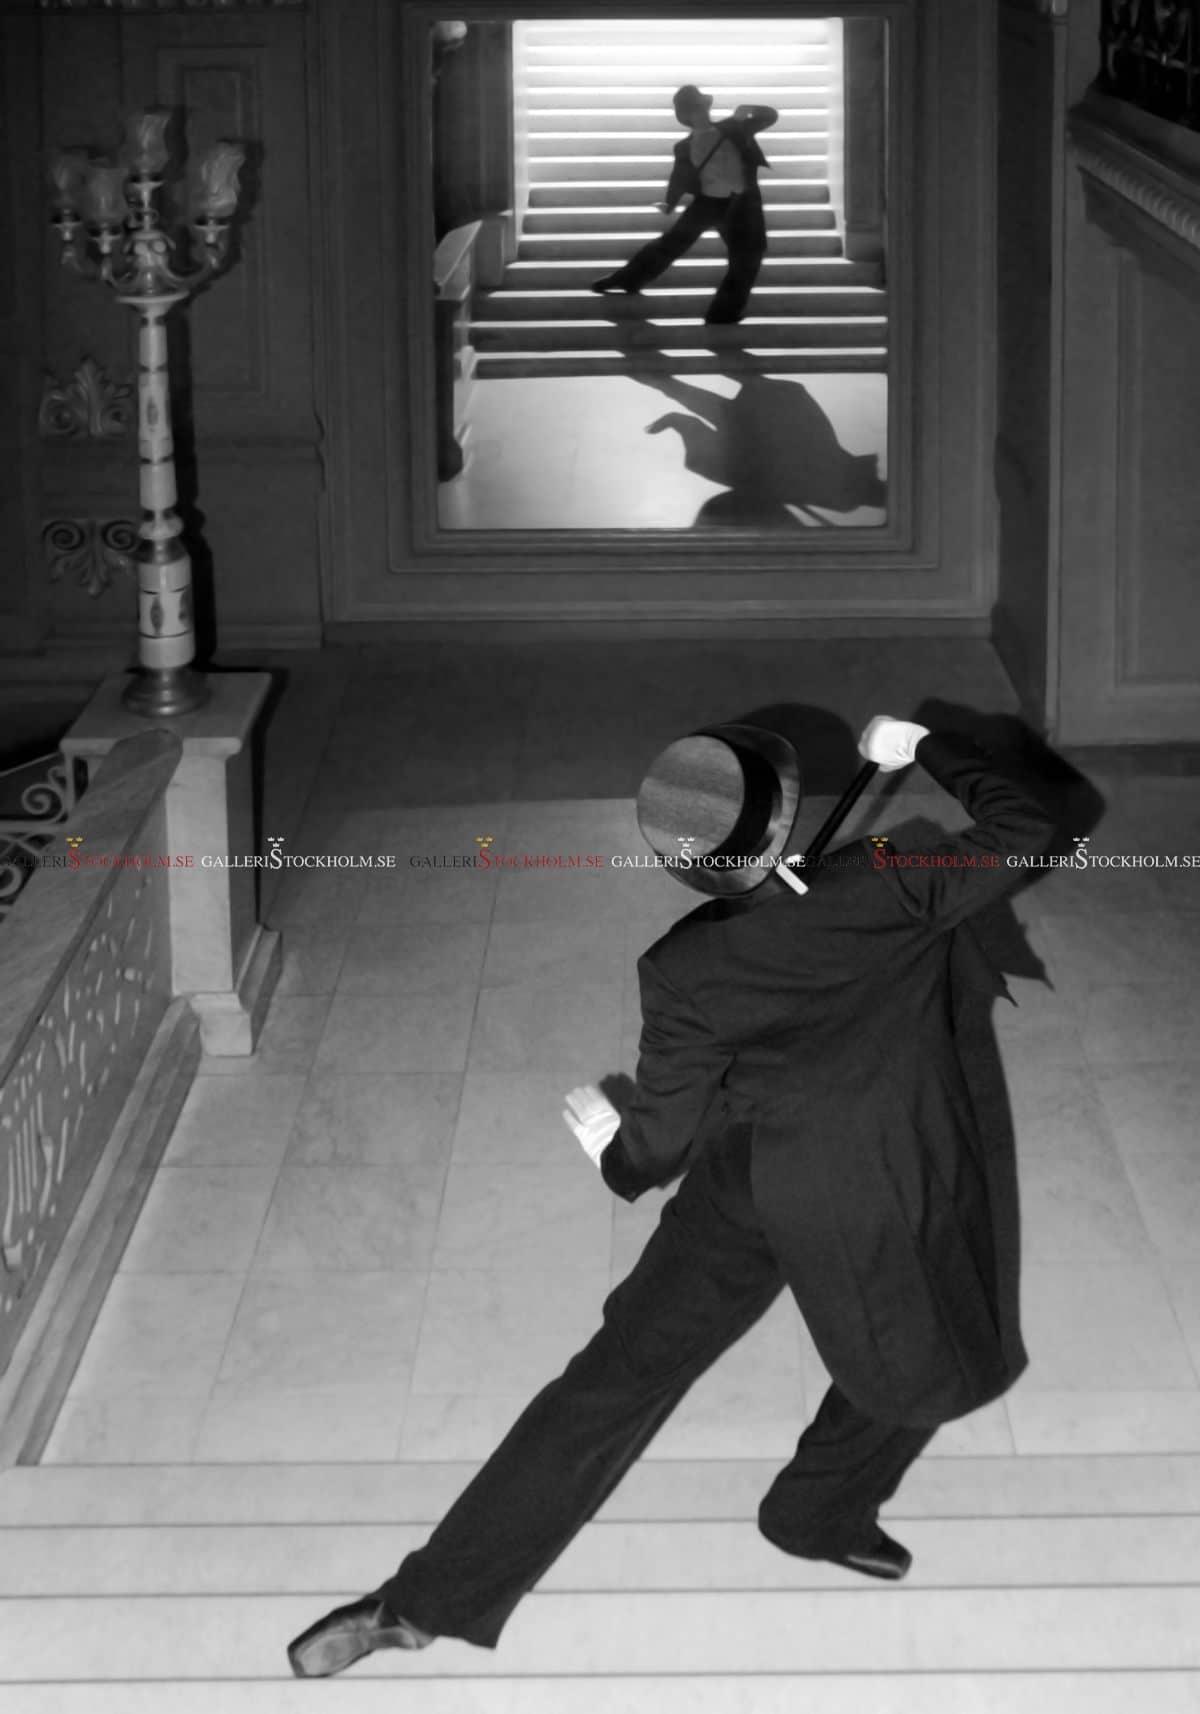 Dmitry Savchenko - Old mirror and silhouette